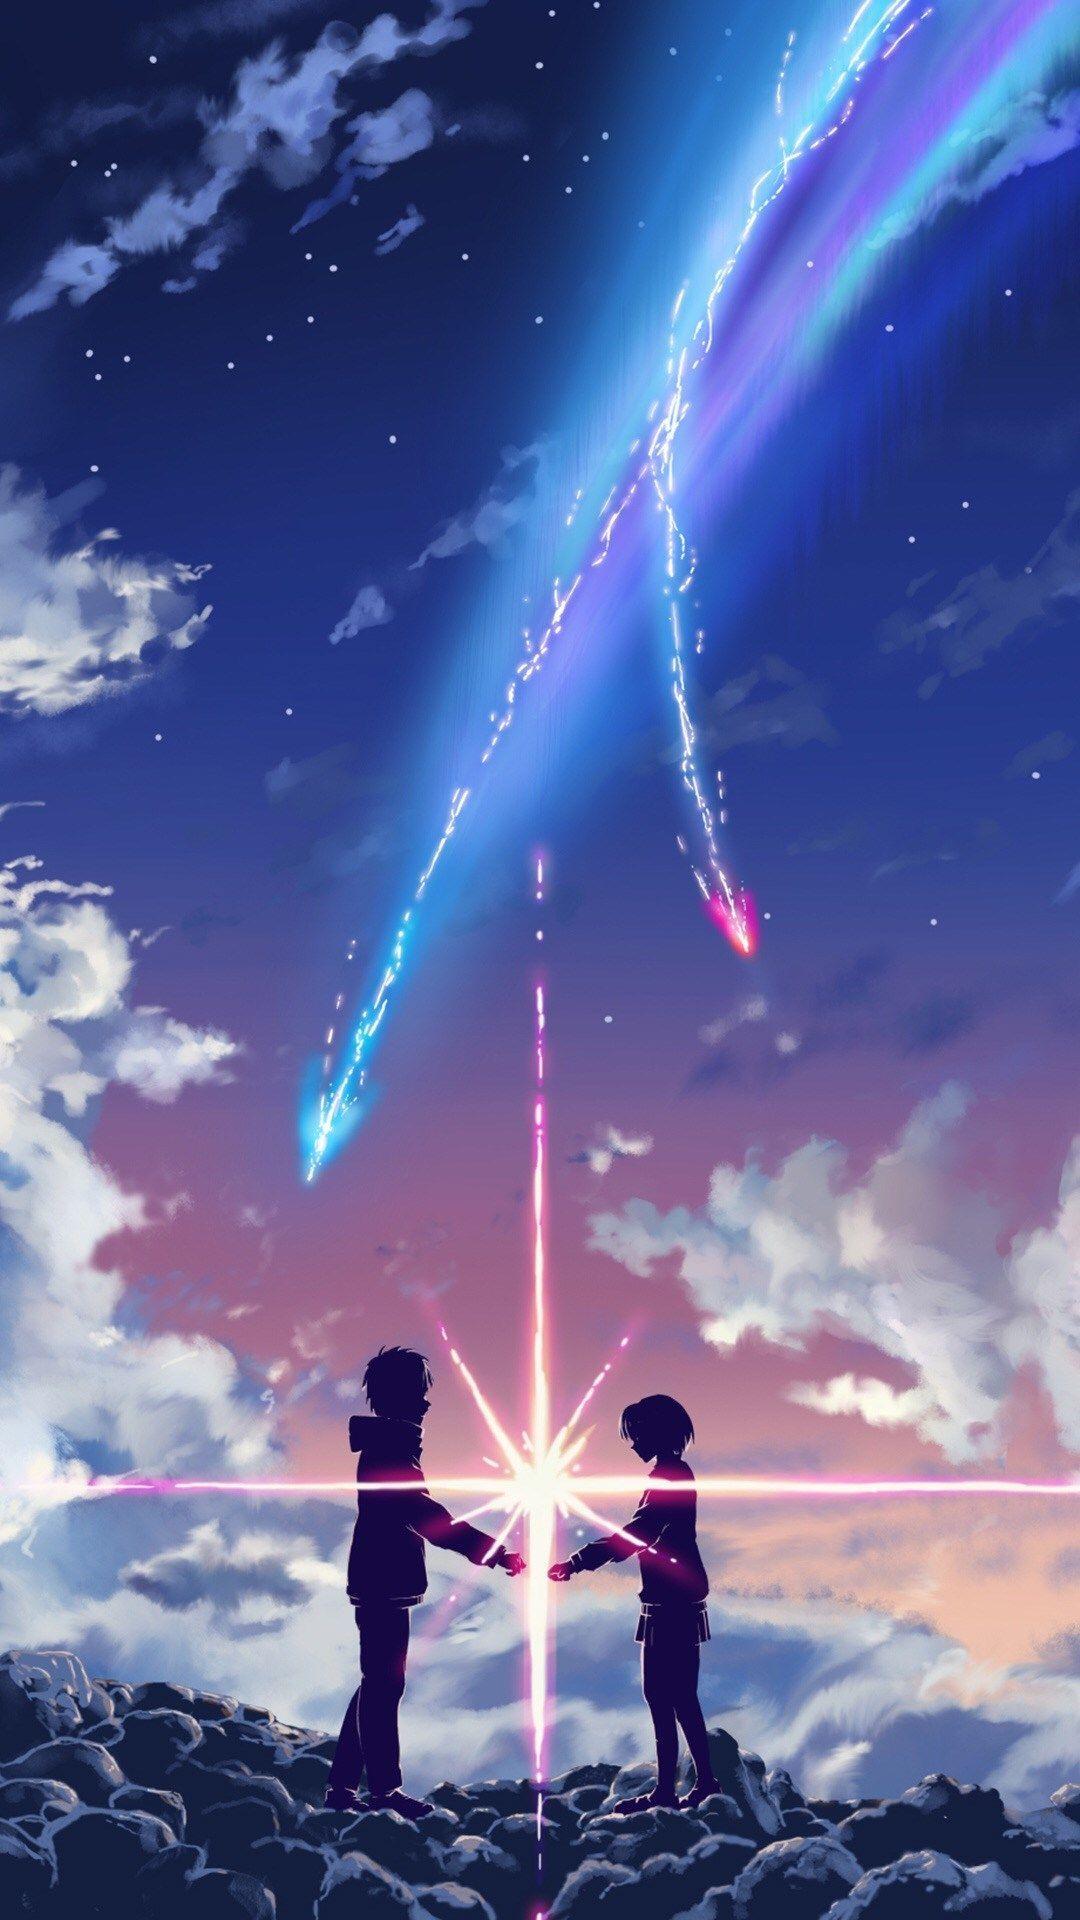 Pin By King Of Dragon On Kimi No Na Wa Pinterest Anime